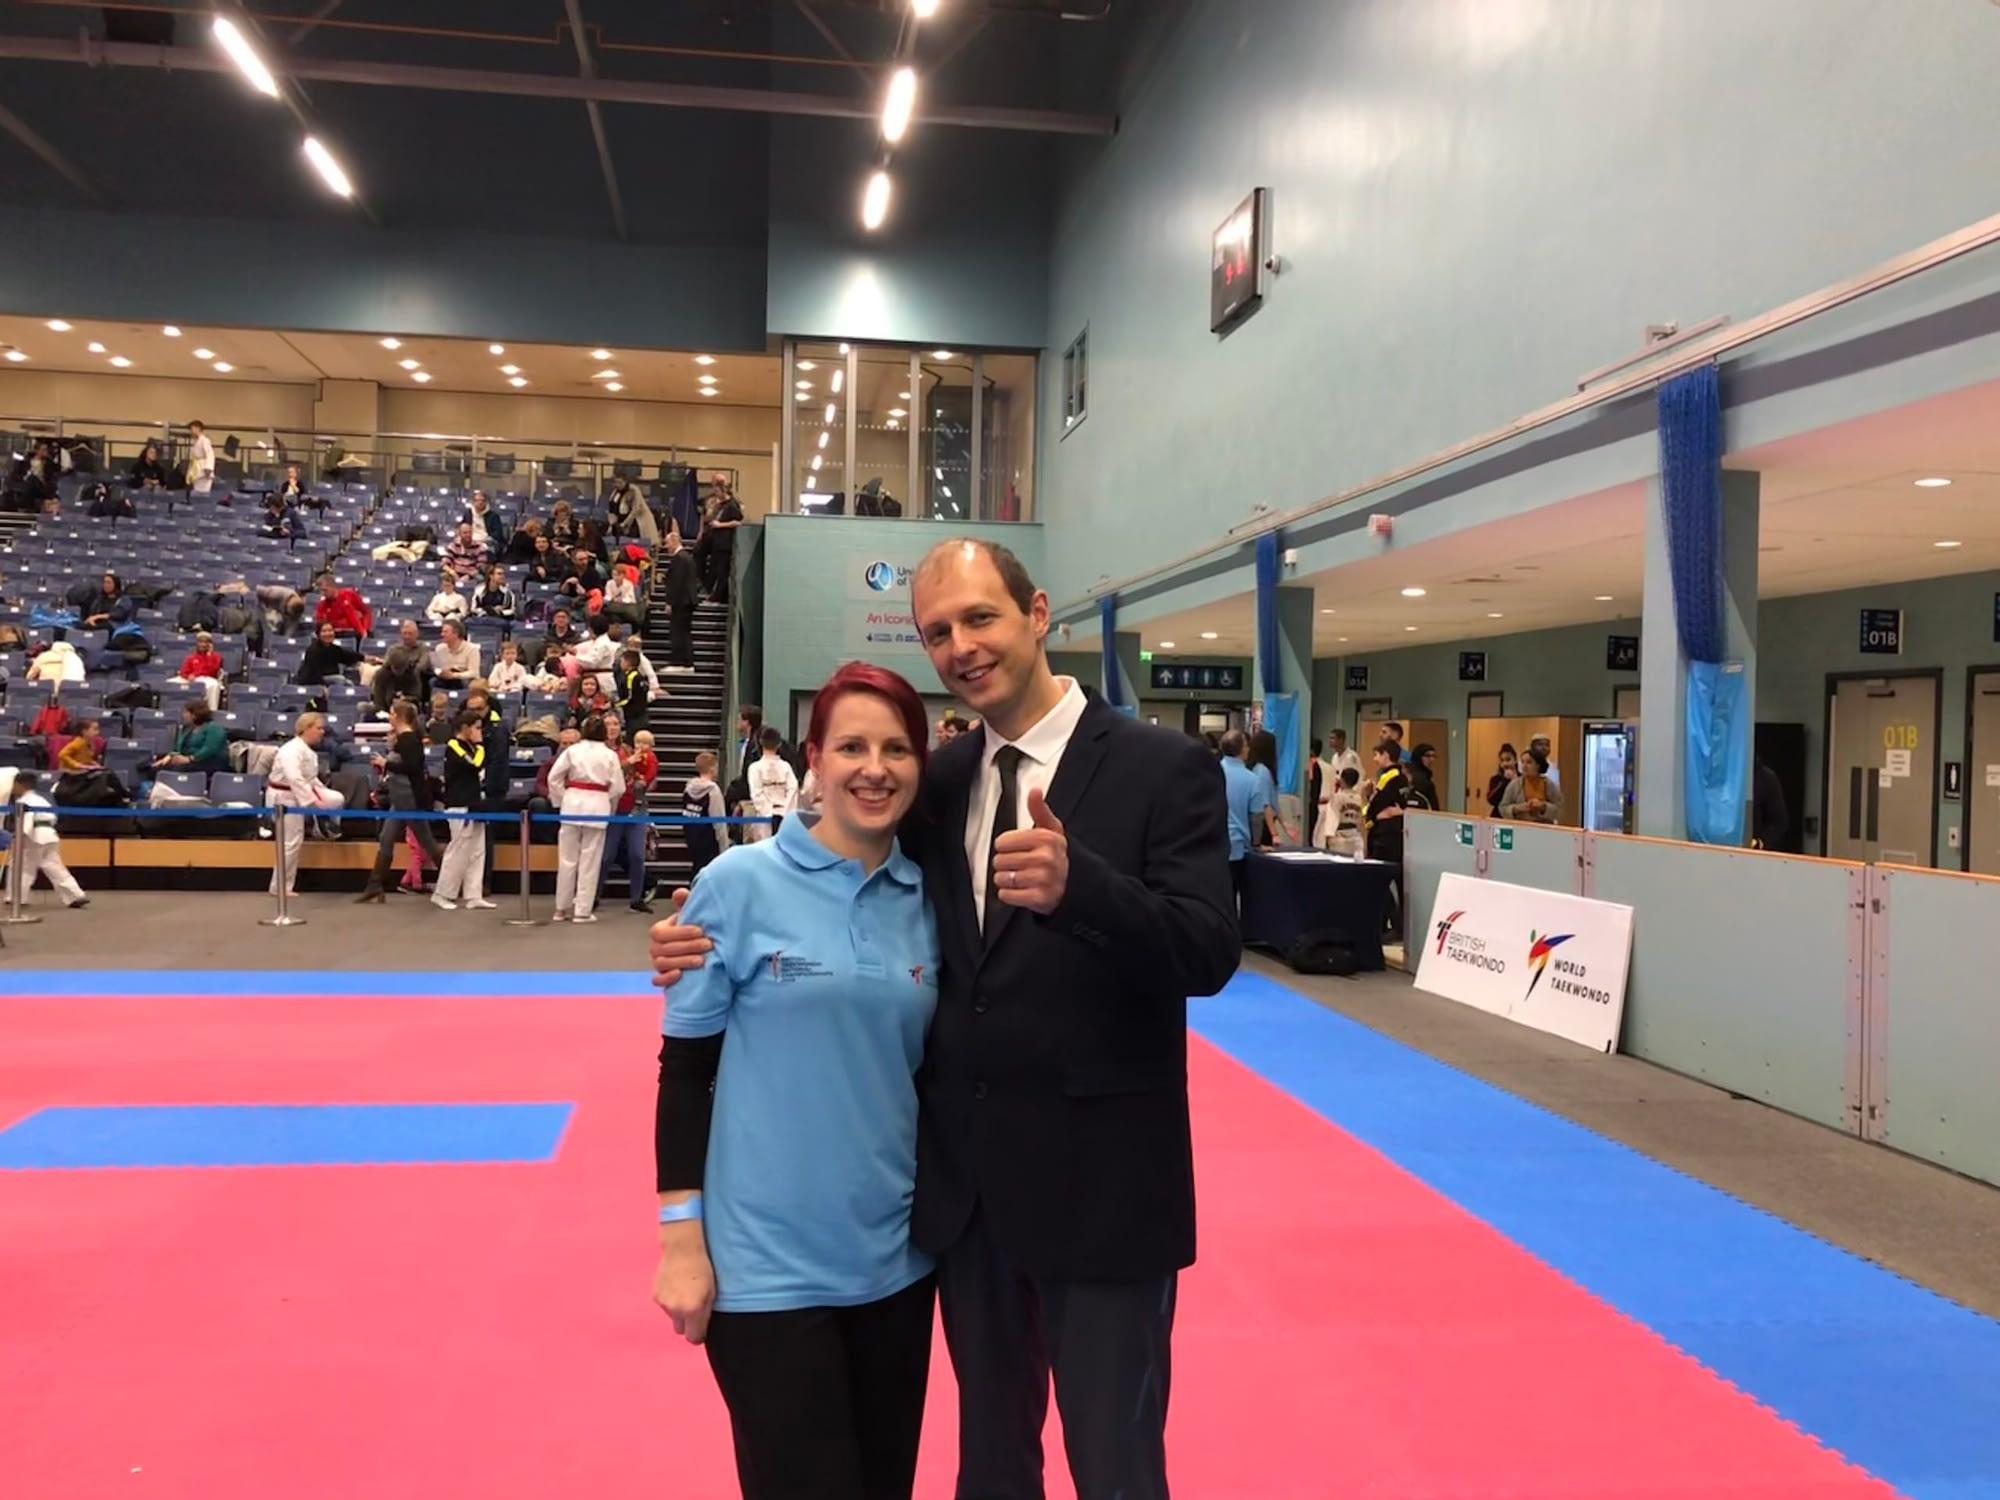 Taekwondo4Fitness Club Team at the National Poomsae Championships